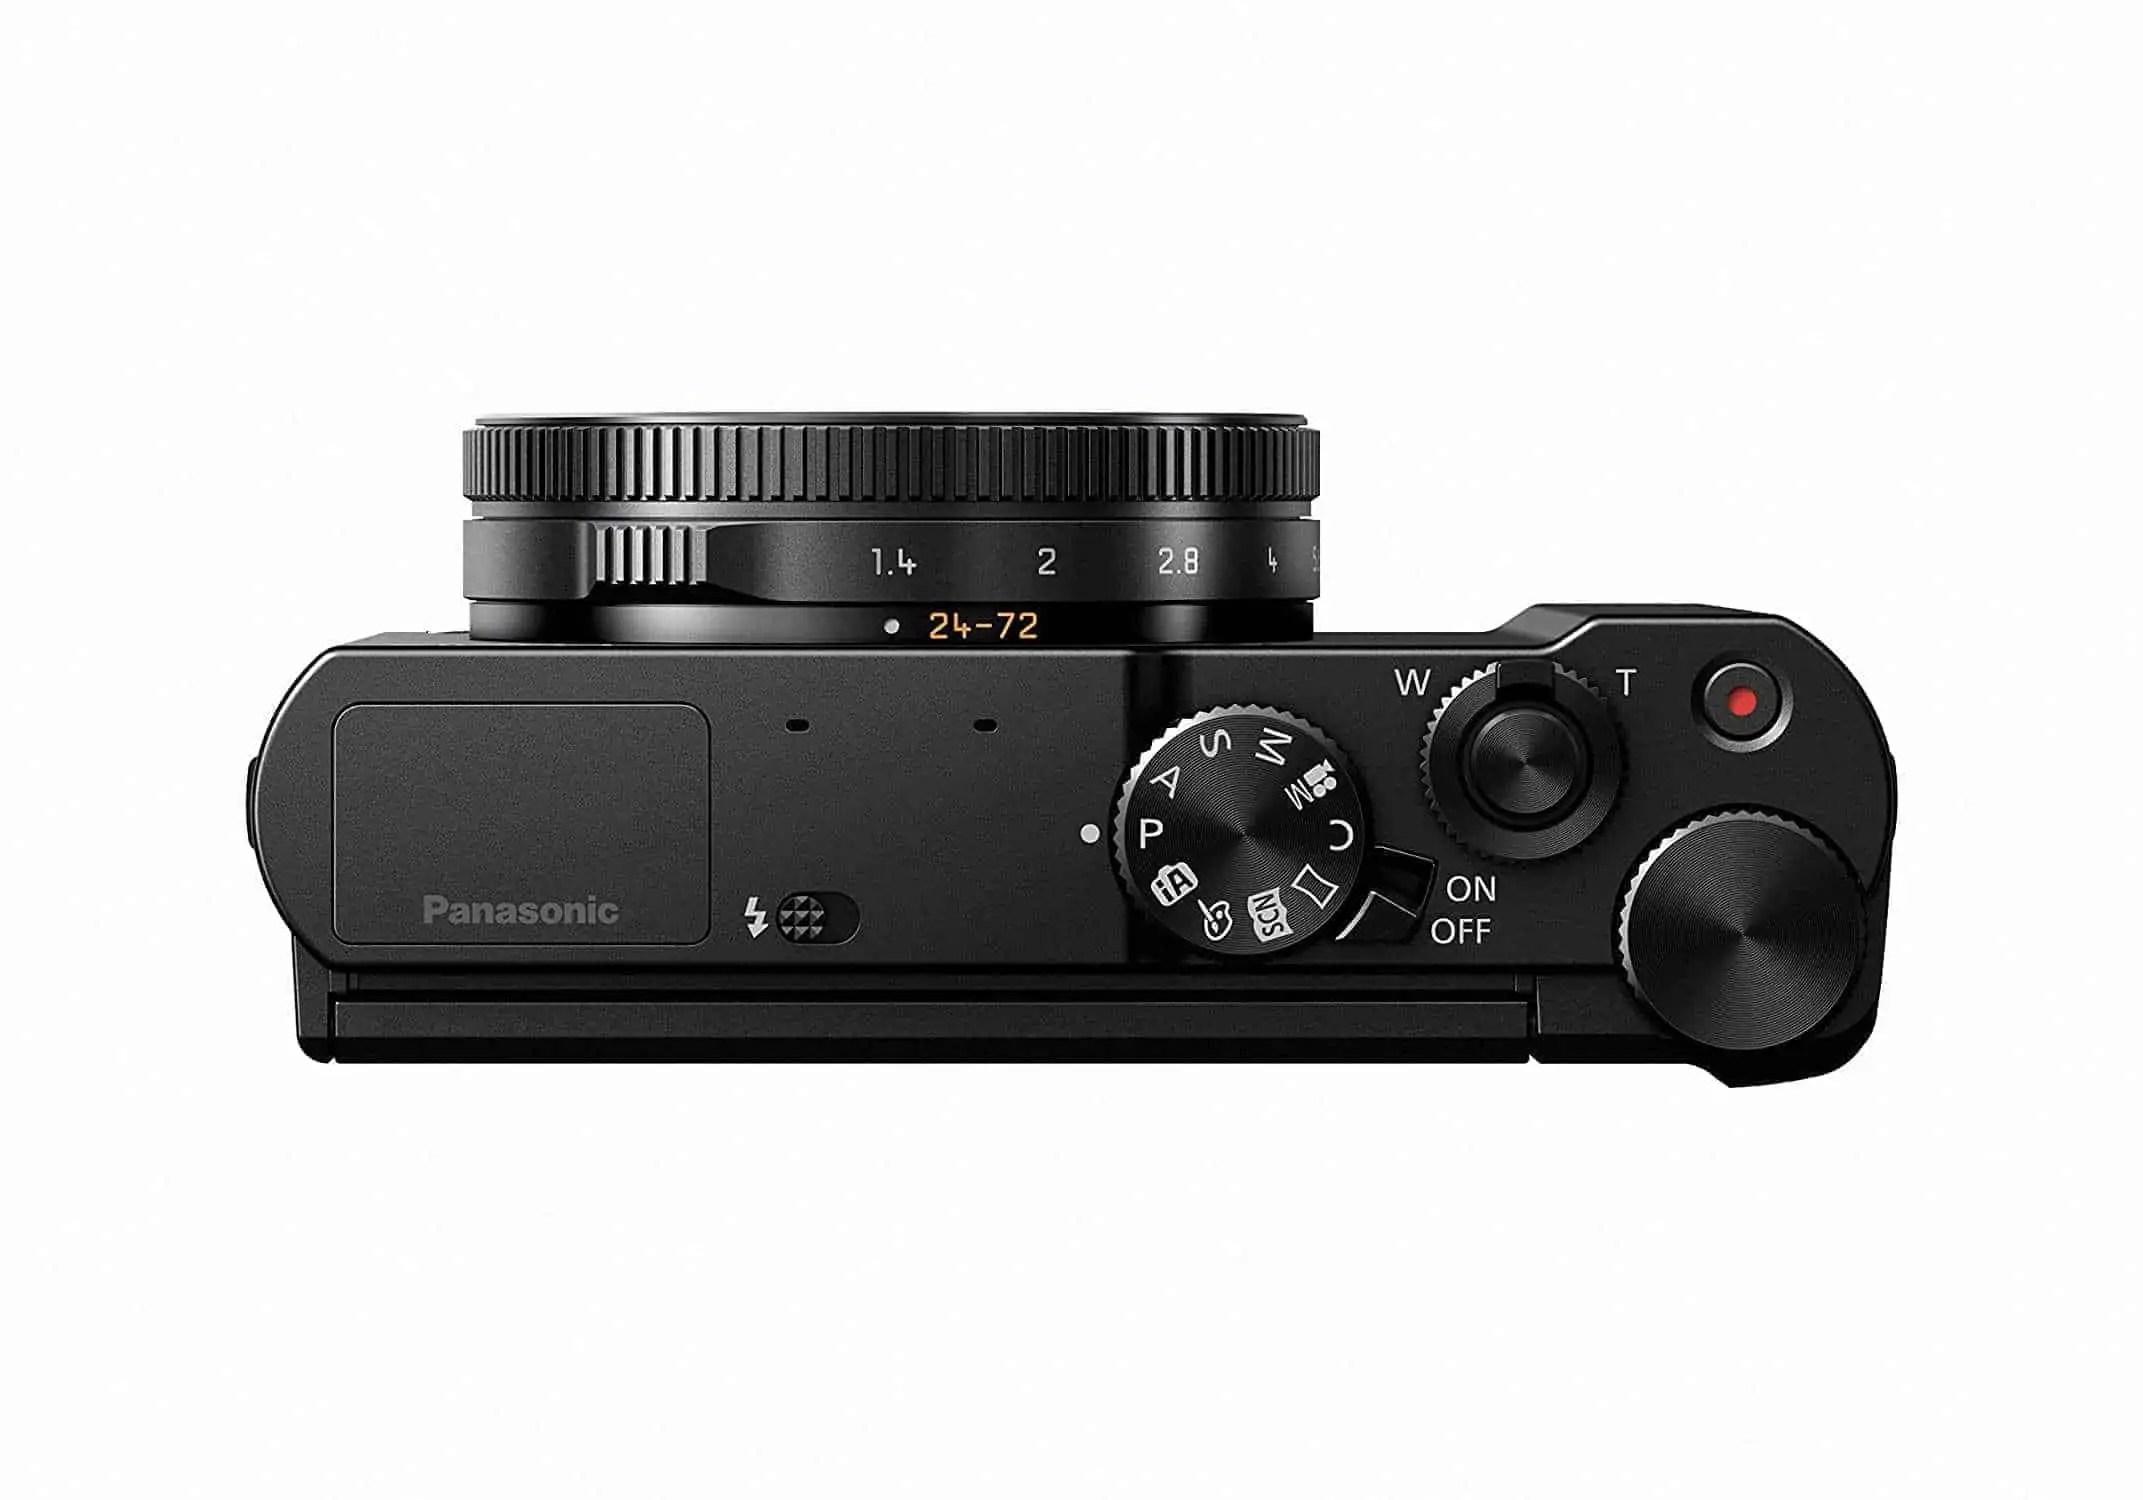 Kompaktkamera Test Welche Ist Beste Allesbeste